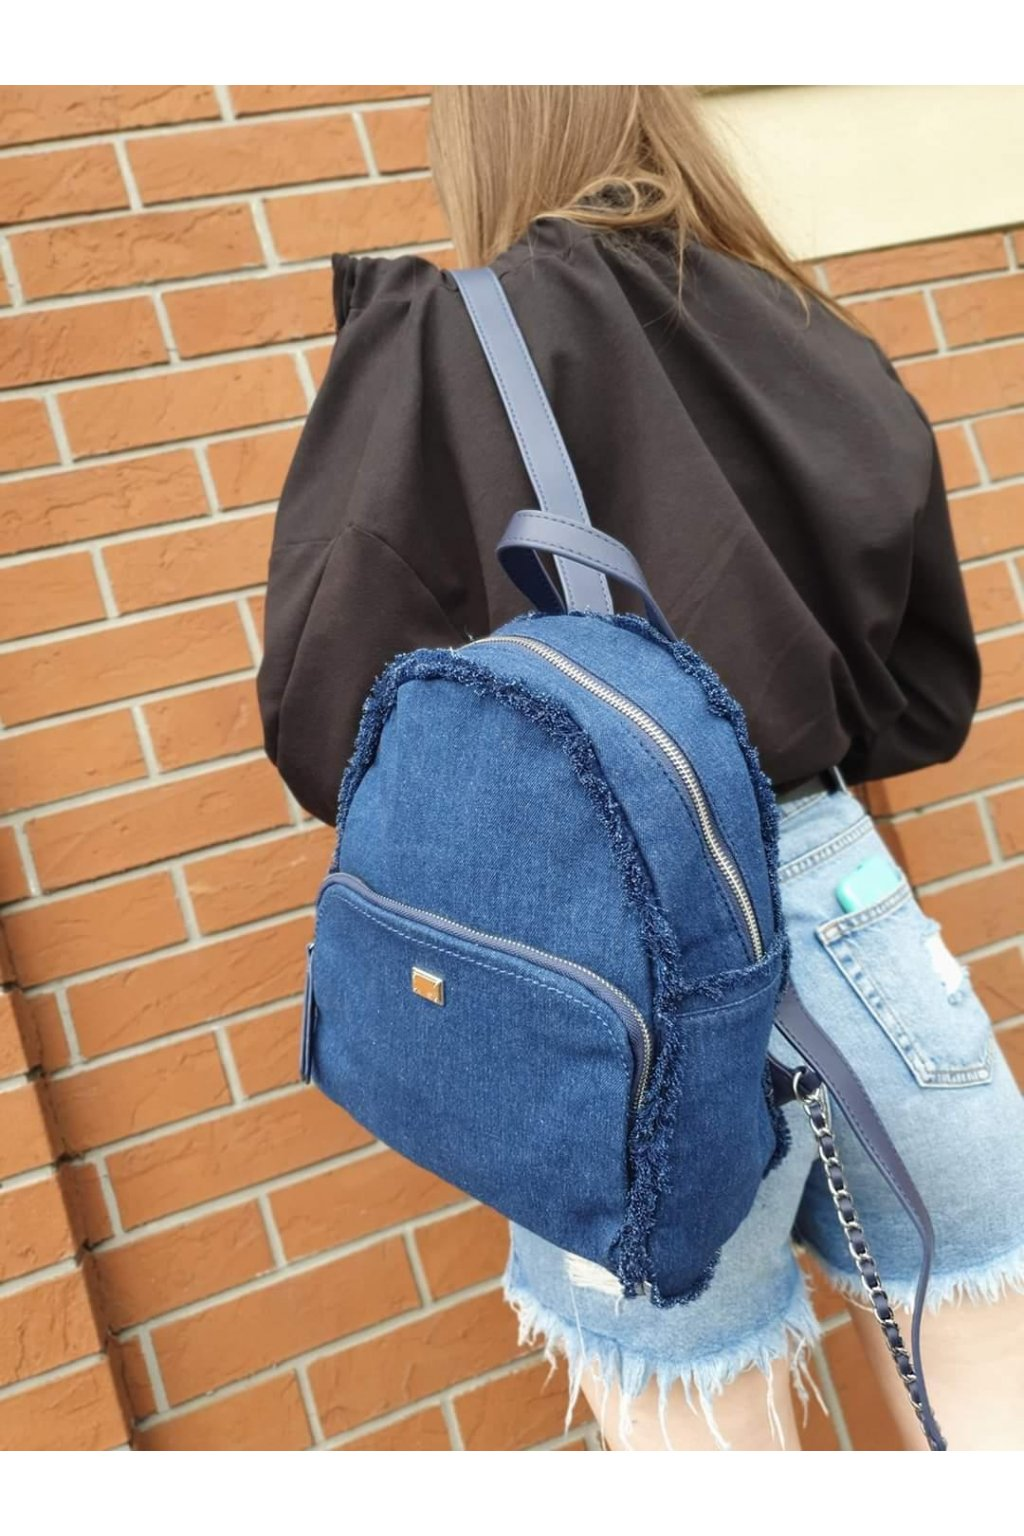 batoh jeans tmavě modrý